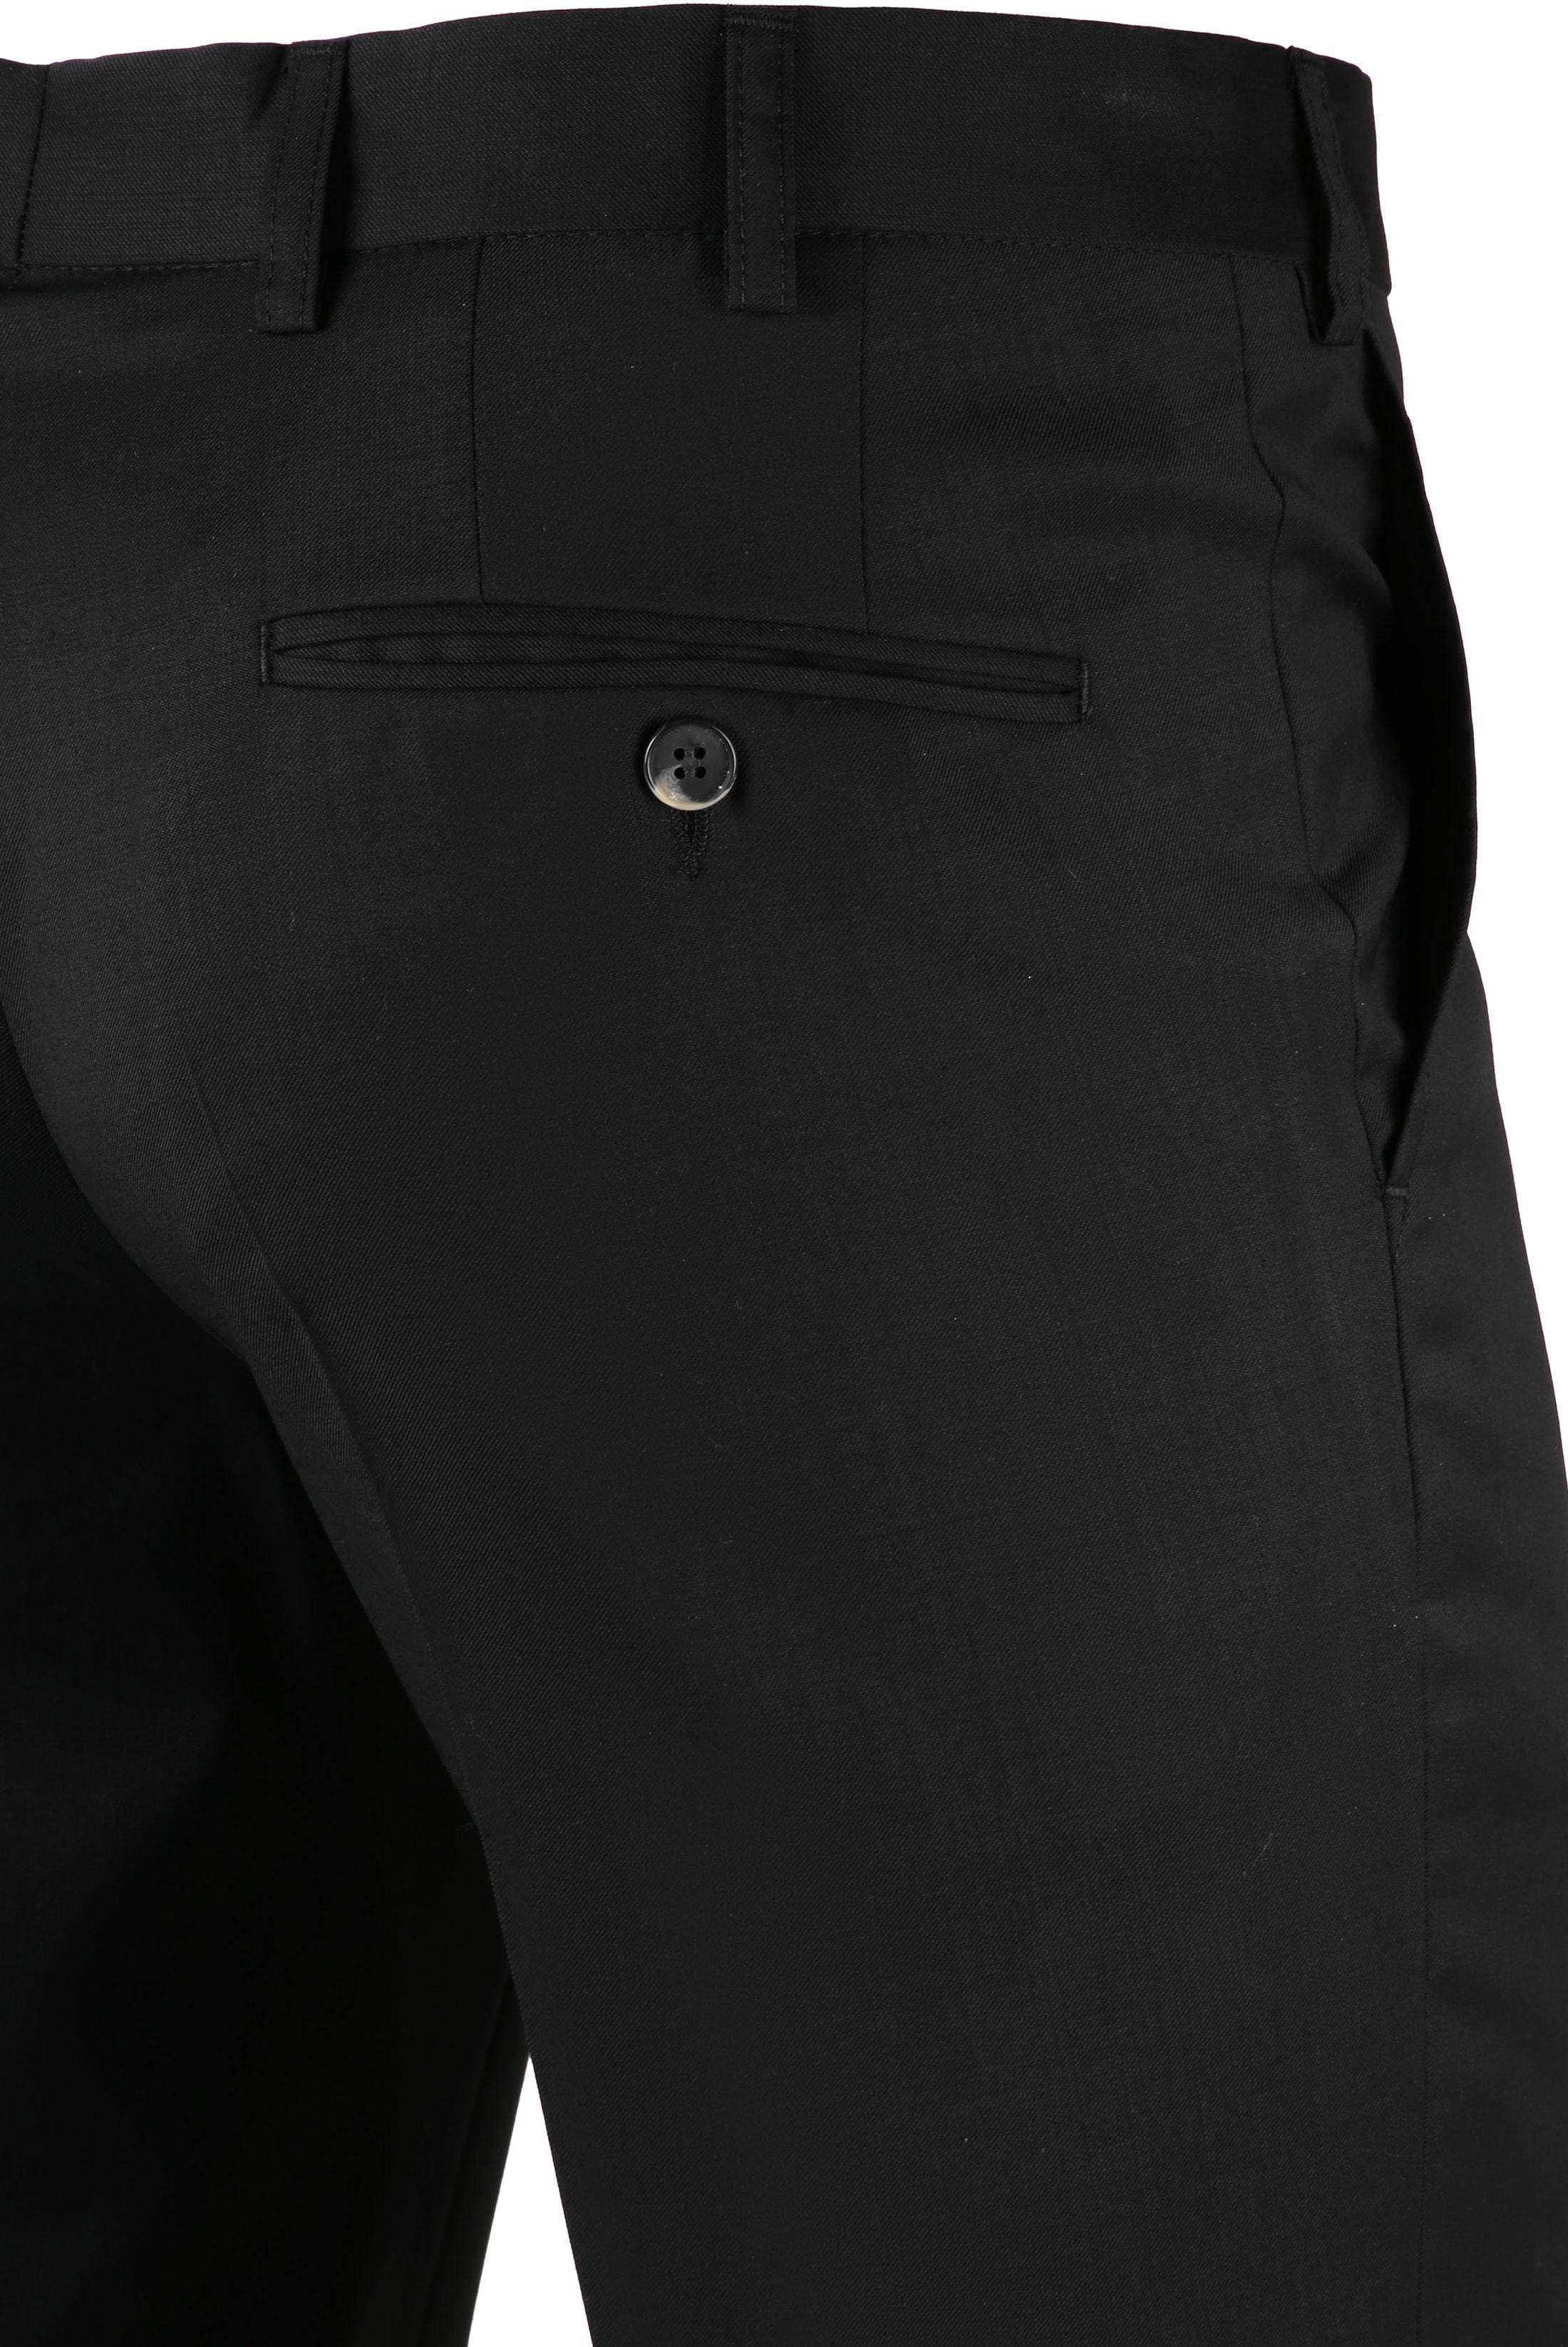 Suitable Pantalon Piga Black photo 1